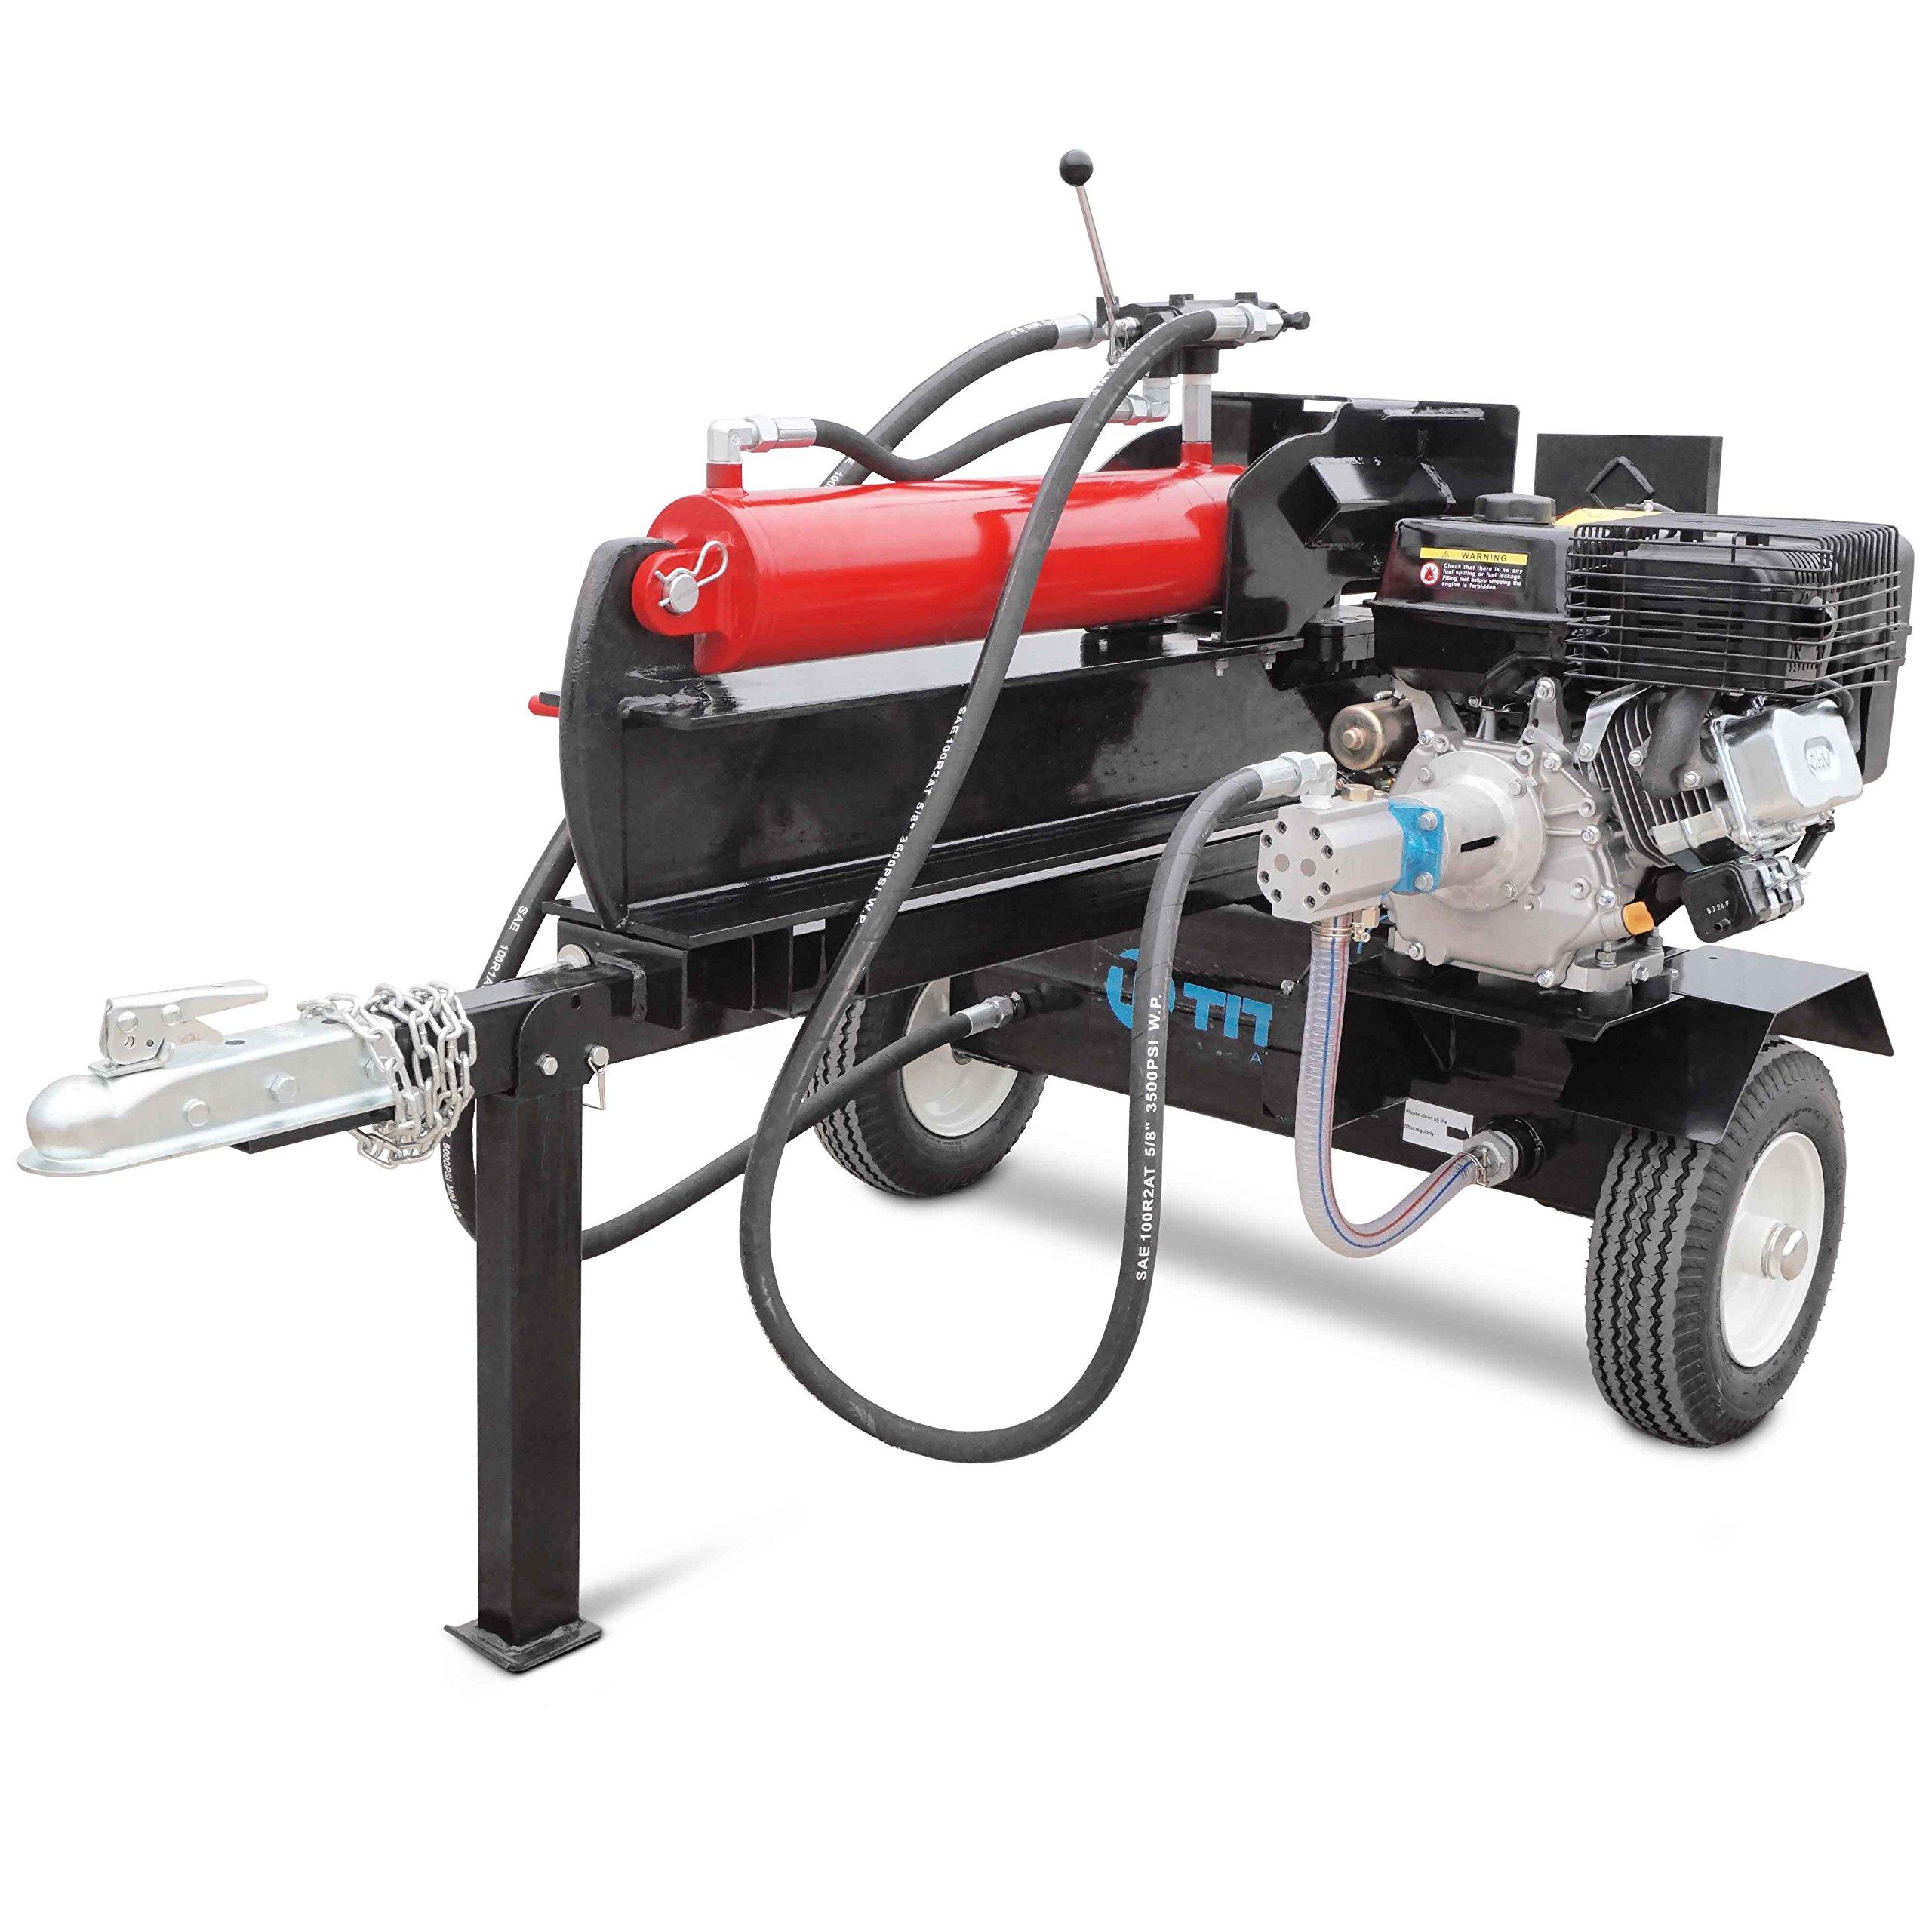 Titan Towable Gas Powered Hydraulic Pivoting Log Wood Splitter 37 Ton Pull Start